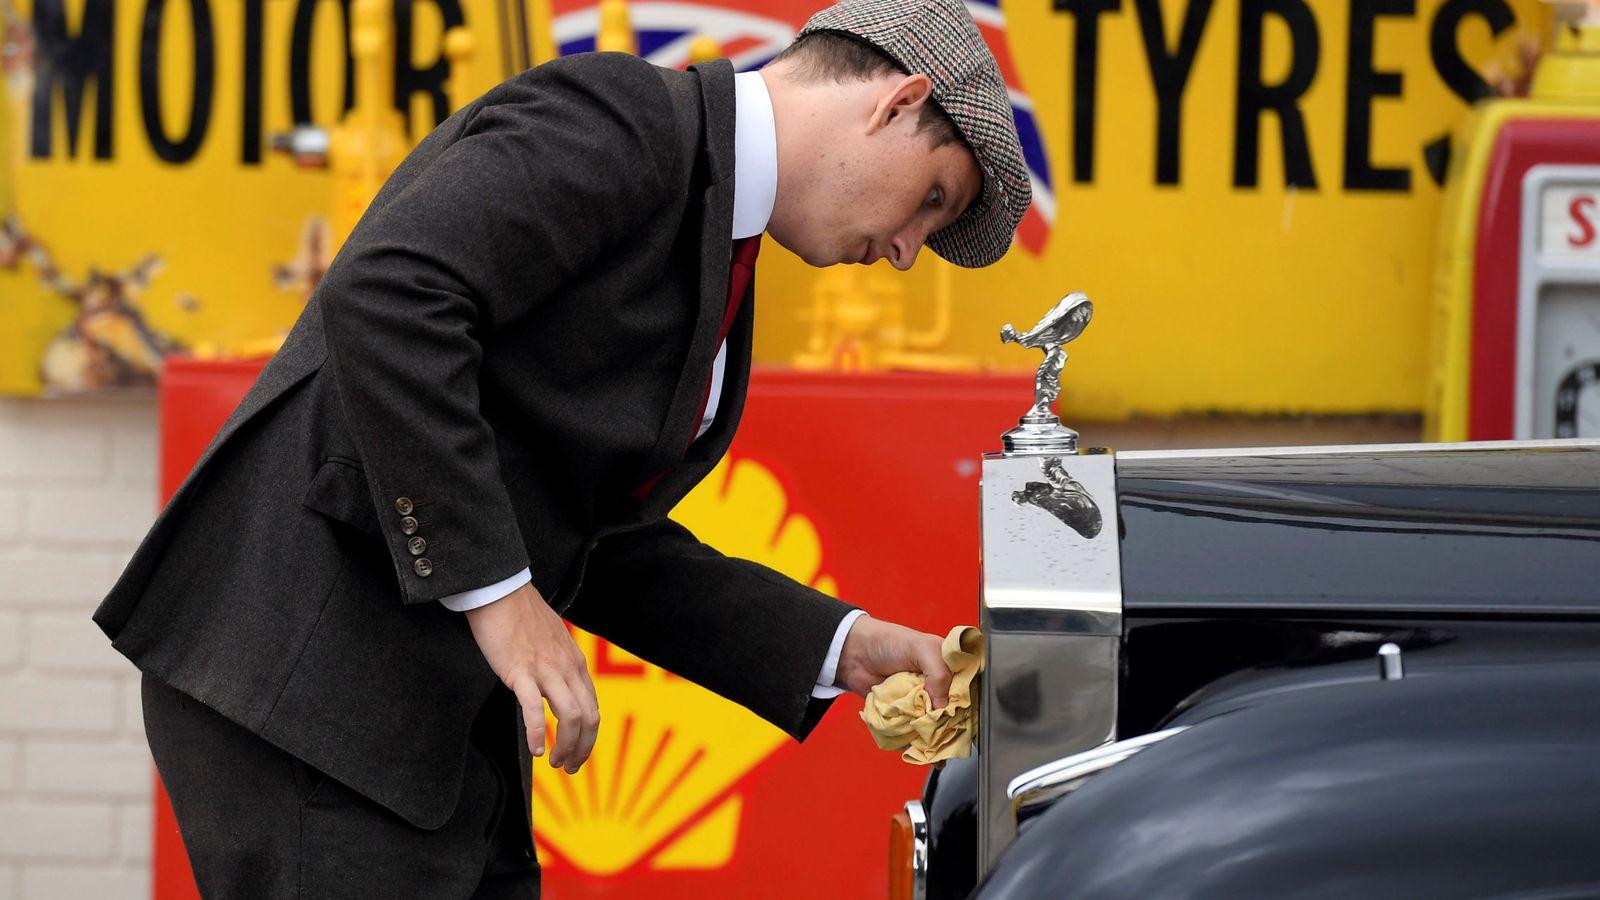 Foto: Un hombre limpia la carrocería de un Rolls Royce en el certamen de coches históricos de Goodwood, Inglaterra. (Reuters)